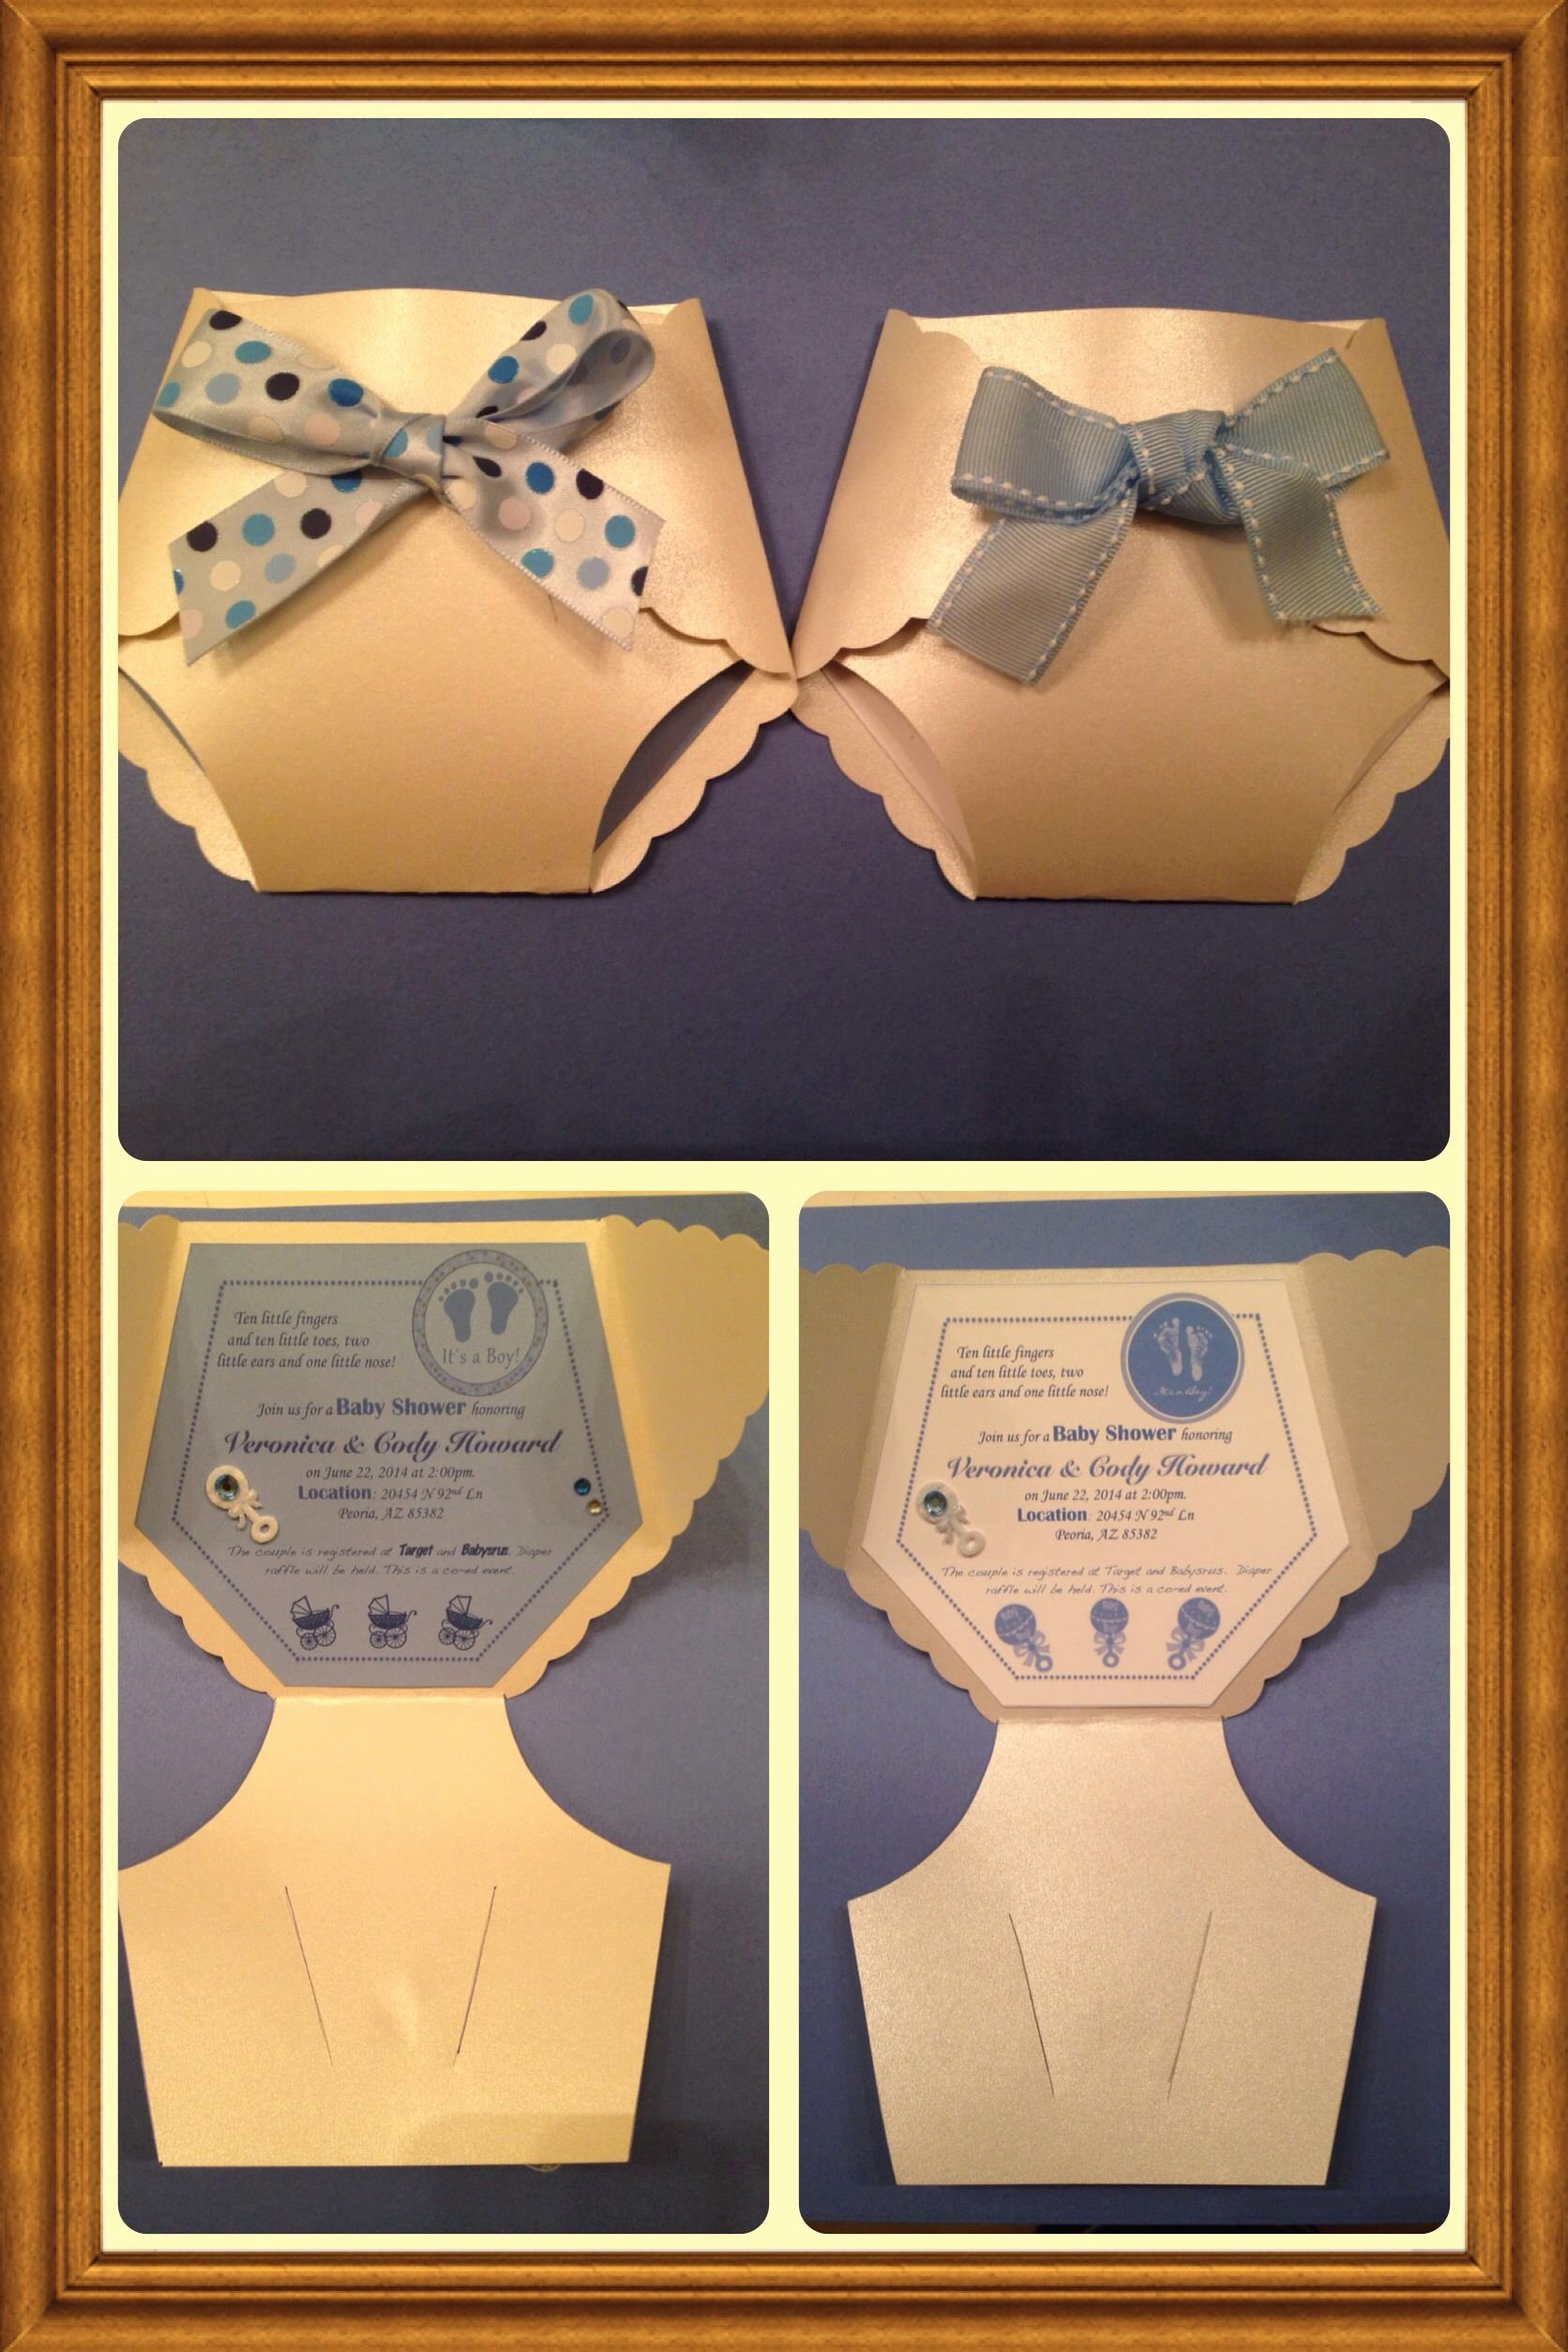 Diaper Party Invitation Template Fresh Diaper Baby Shower Invitation Kept A Neutral Color Scheme